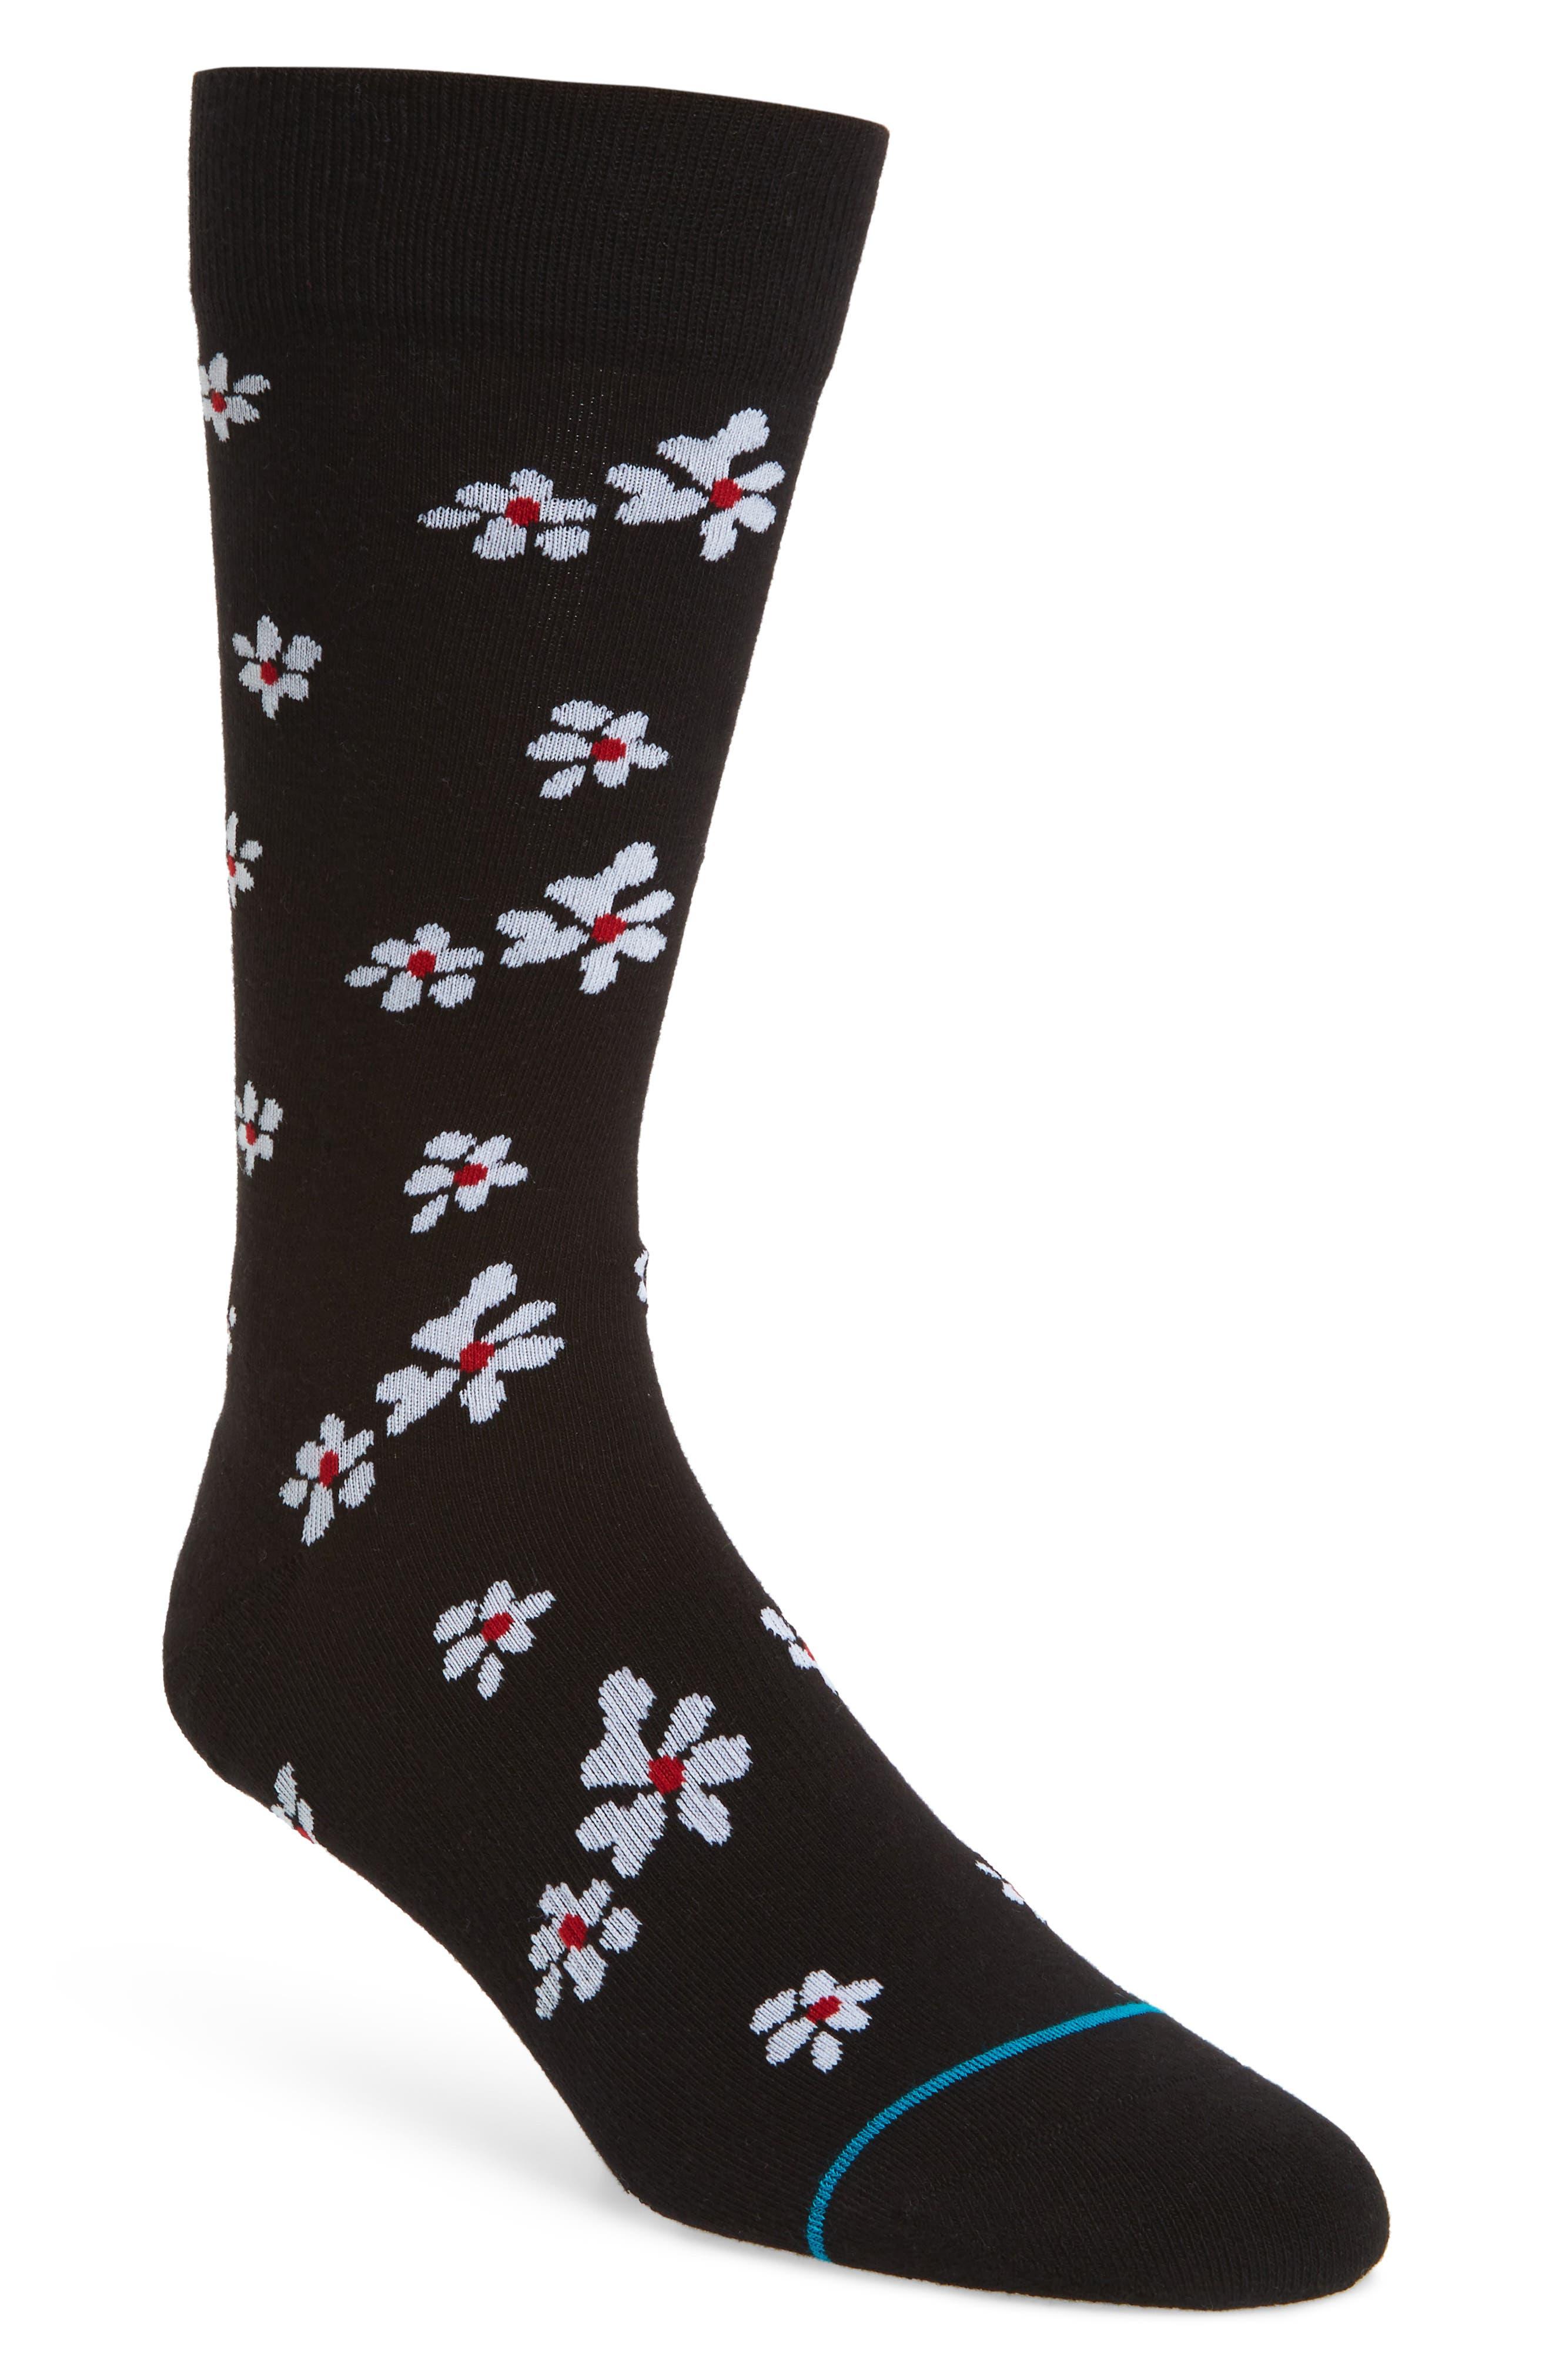 Hendriksen Crew Socks,                             Main thumbnail 1, color,                             001